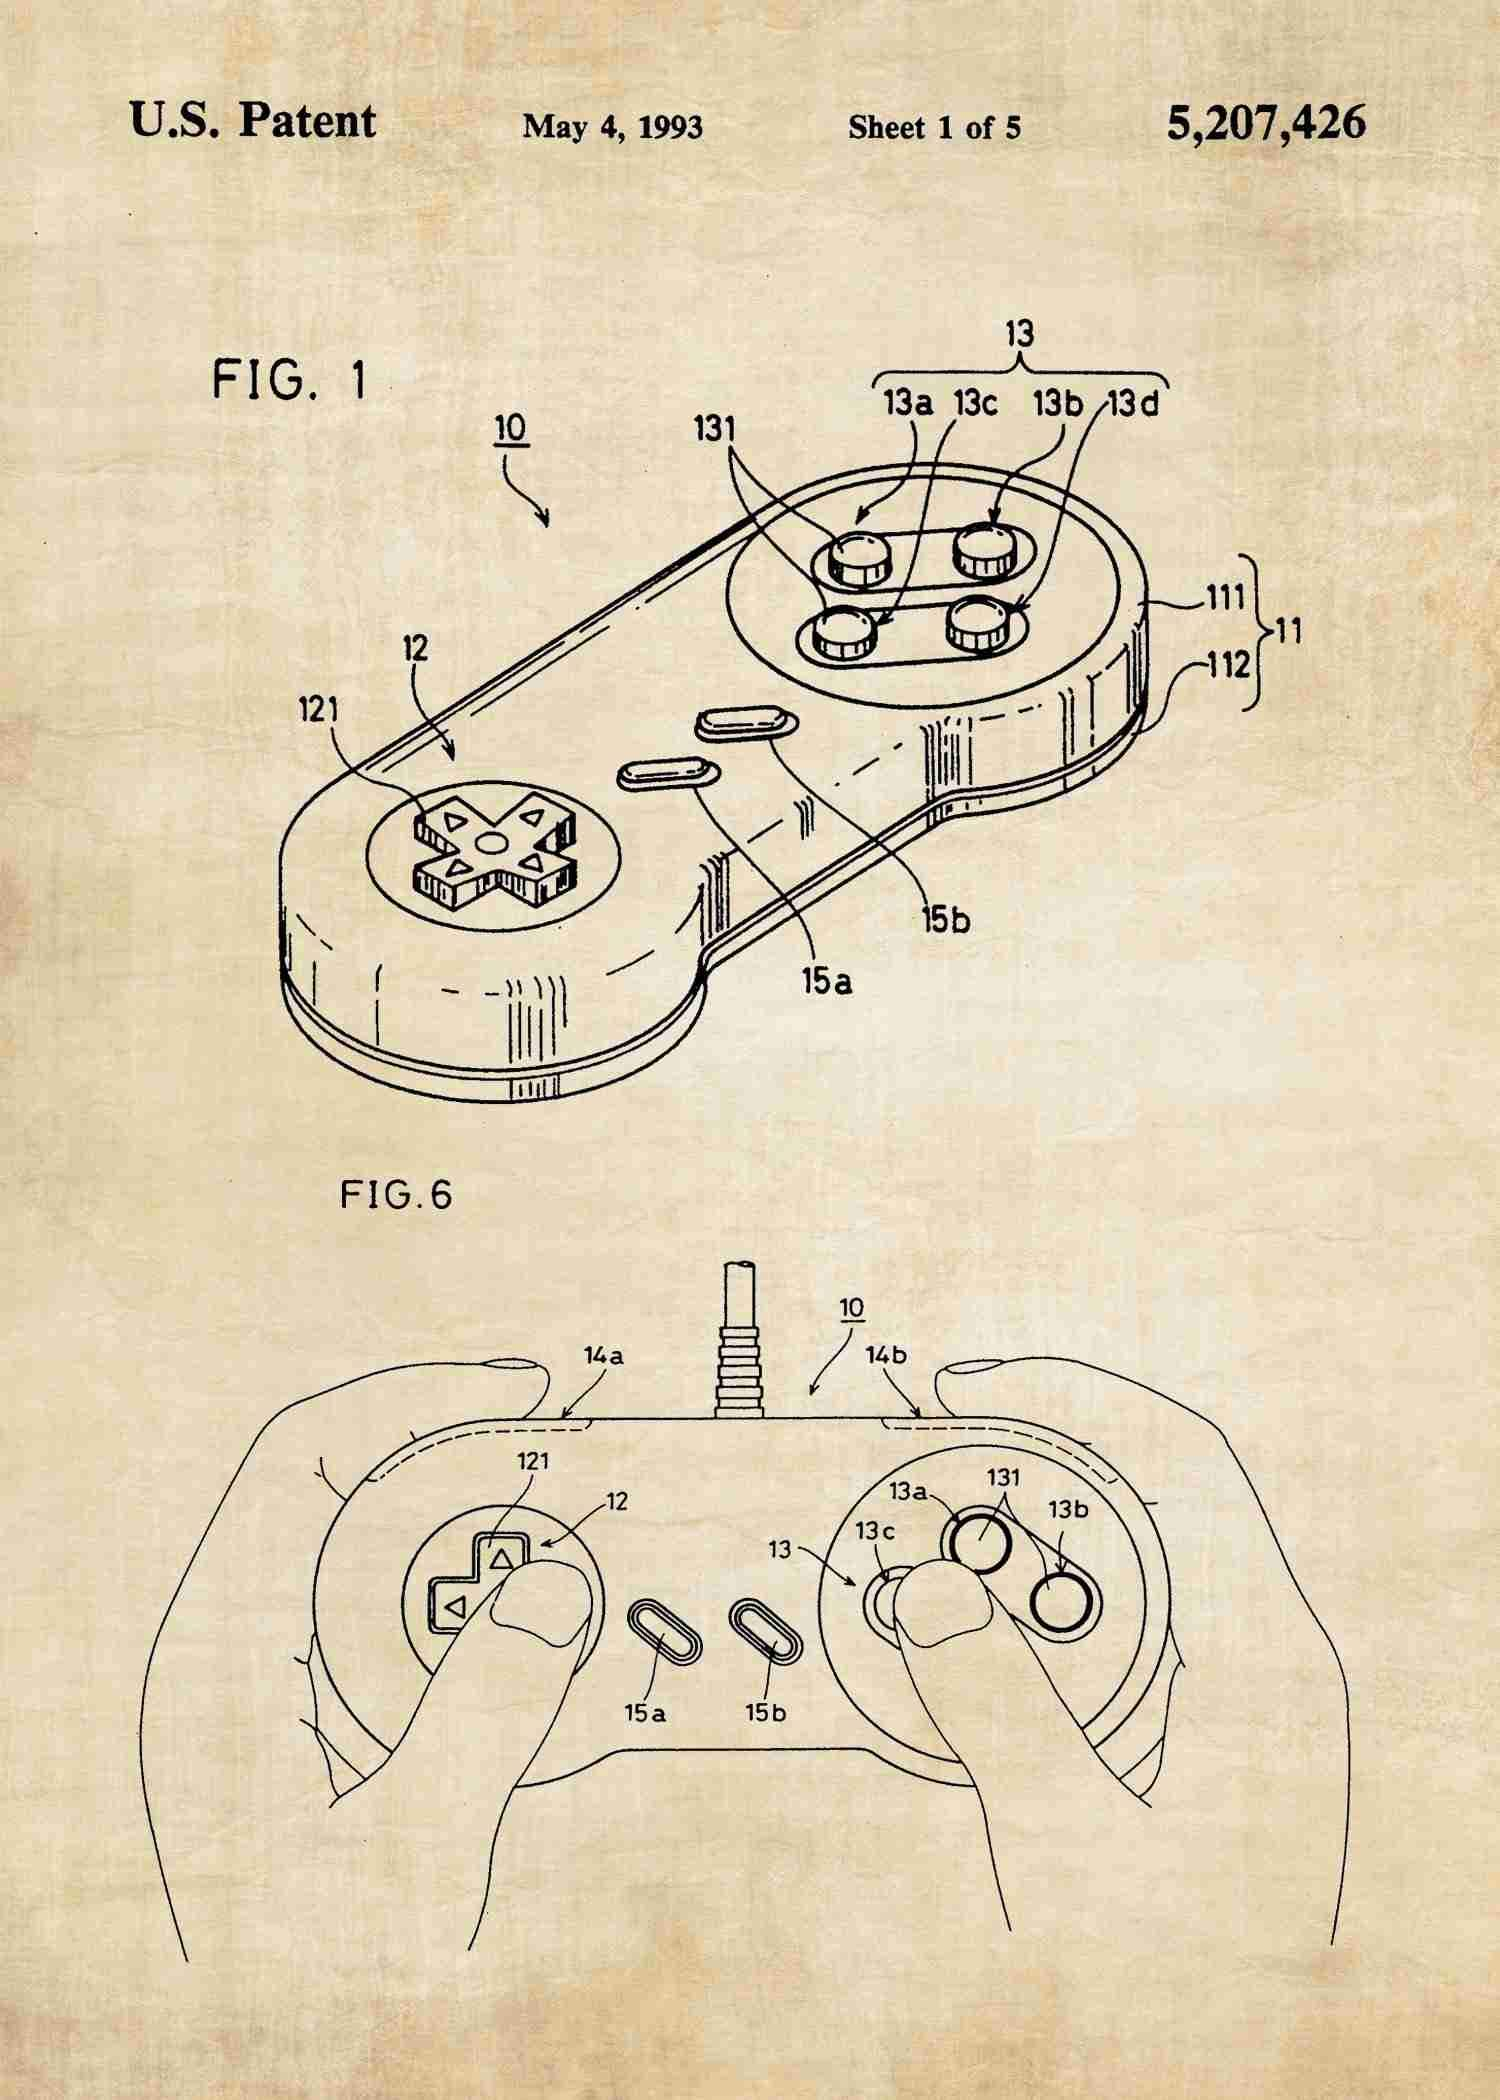 Super Nes Schematics Explained Wiring Diagrams Nintendo Diagram Controller Schematic Sbc Drawings